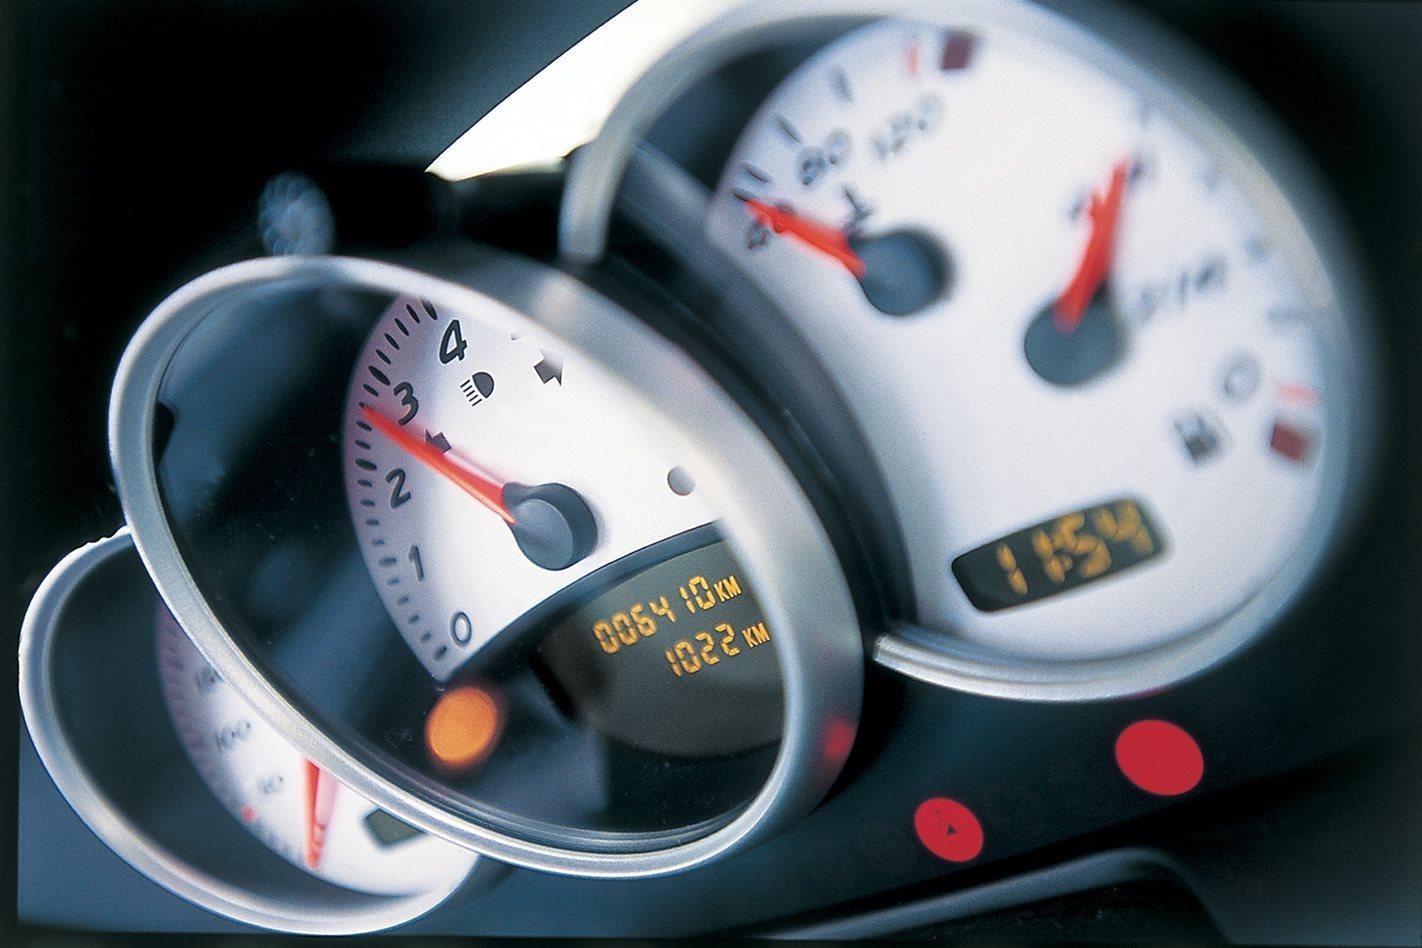 2003 Porsche Boxster S speedo